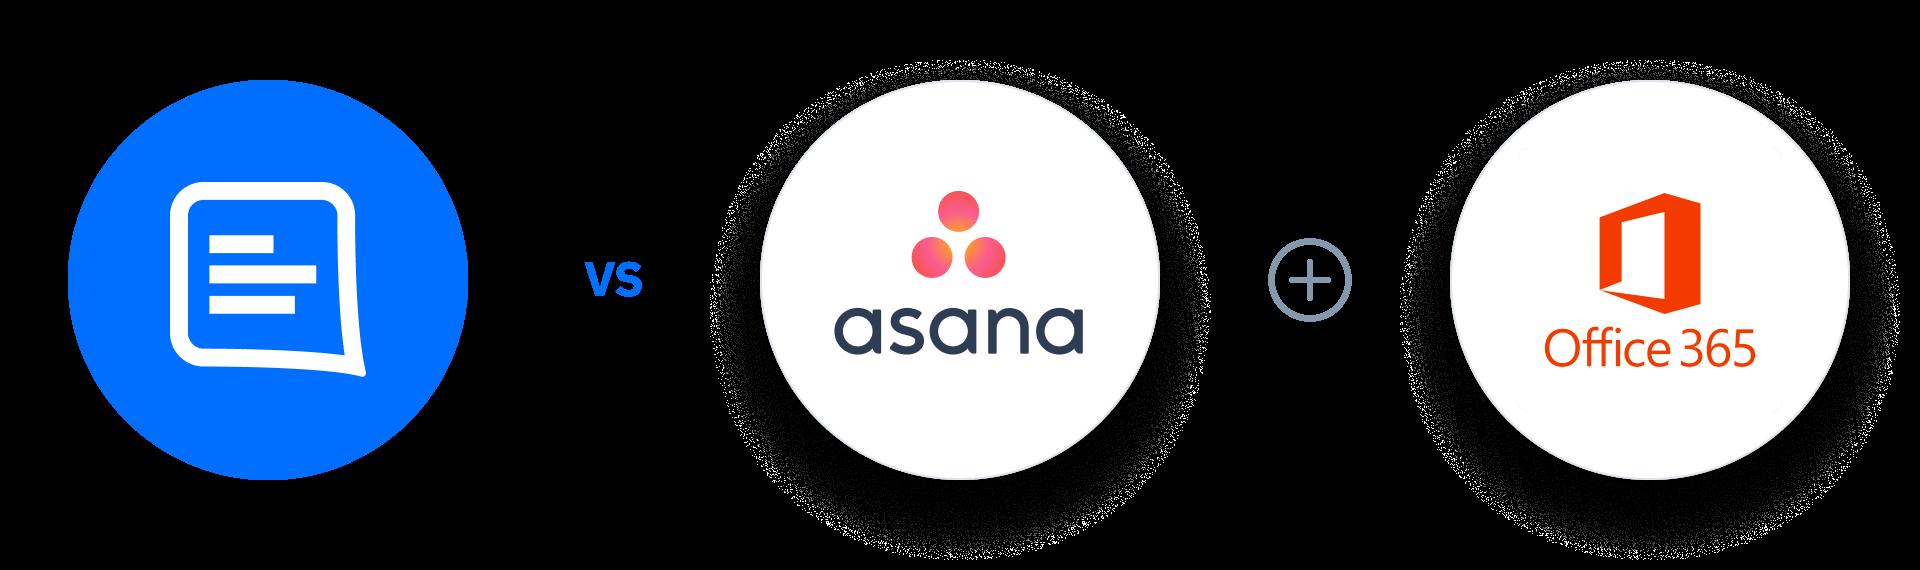 GC Vs Asana + Office 365